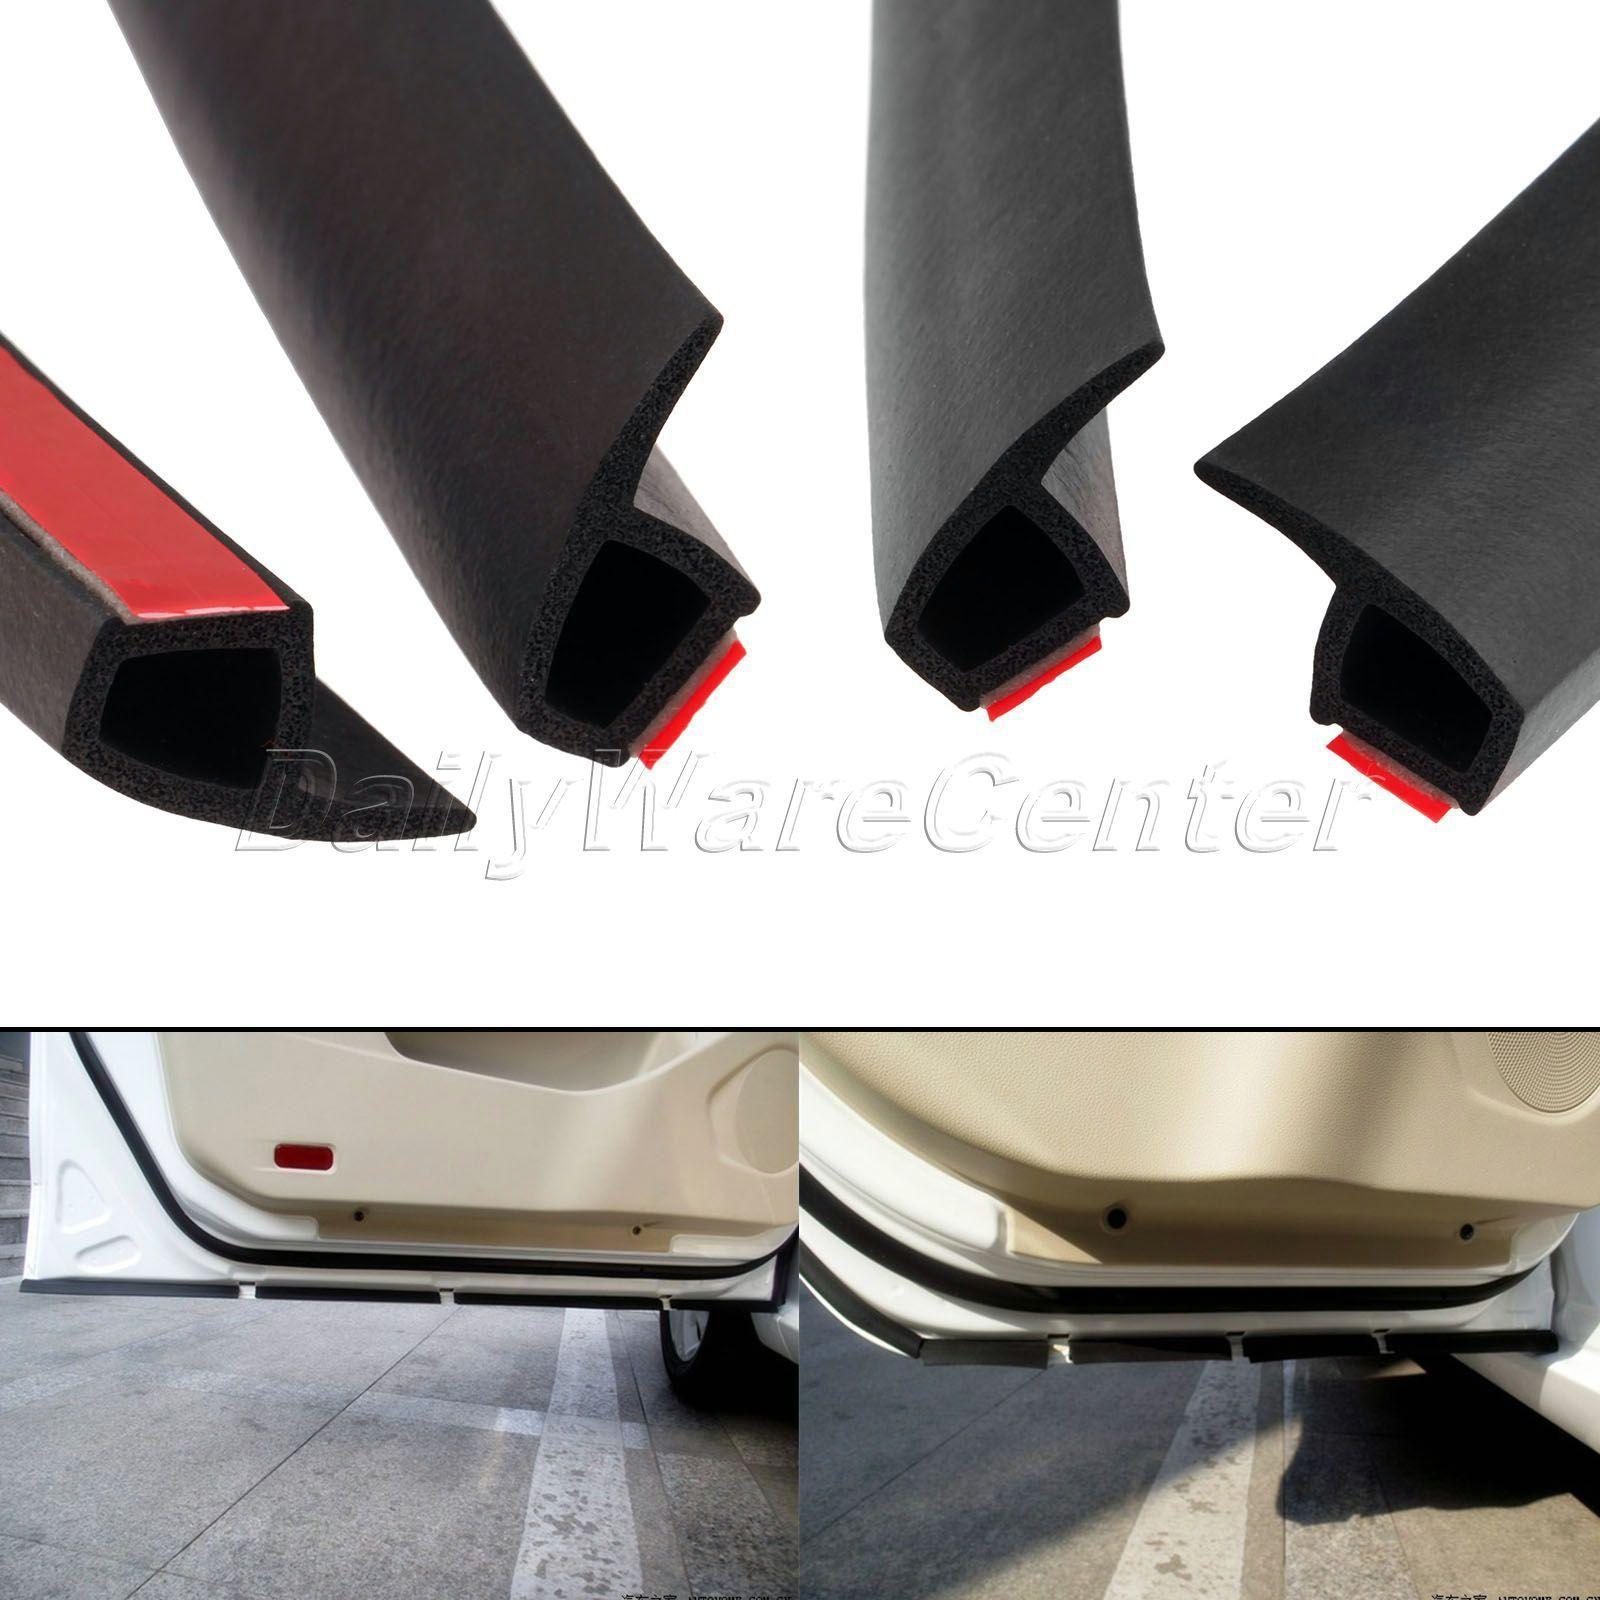 200 508cm Edge Trim Weather Stripping Universal Car Door Rubber Seal Strip Decoration Protect Tinted Windows Car Glass Shower Door Seals Car Door Rubber Seal